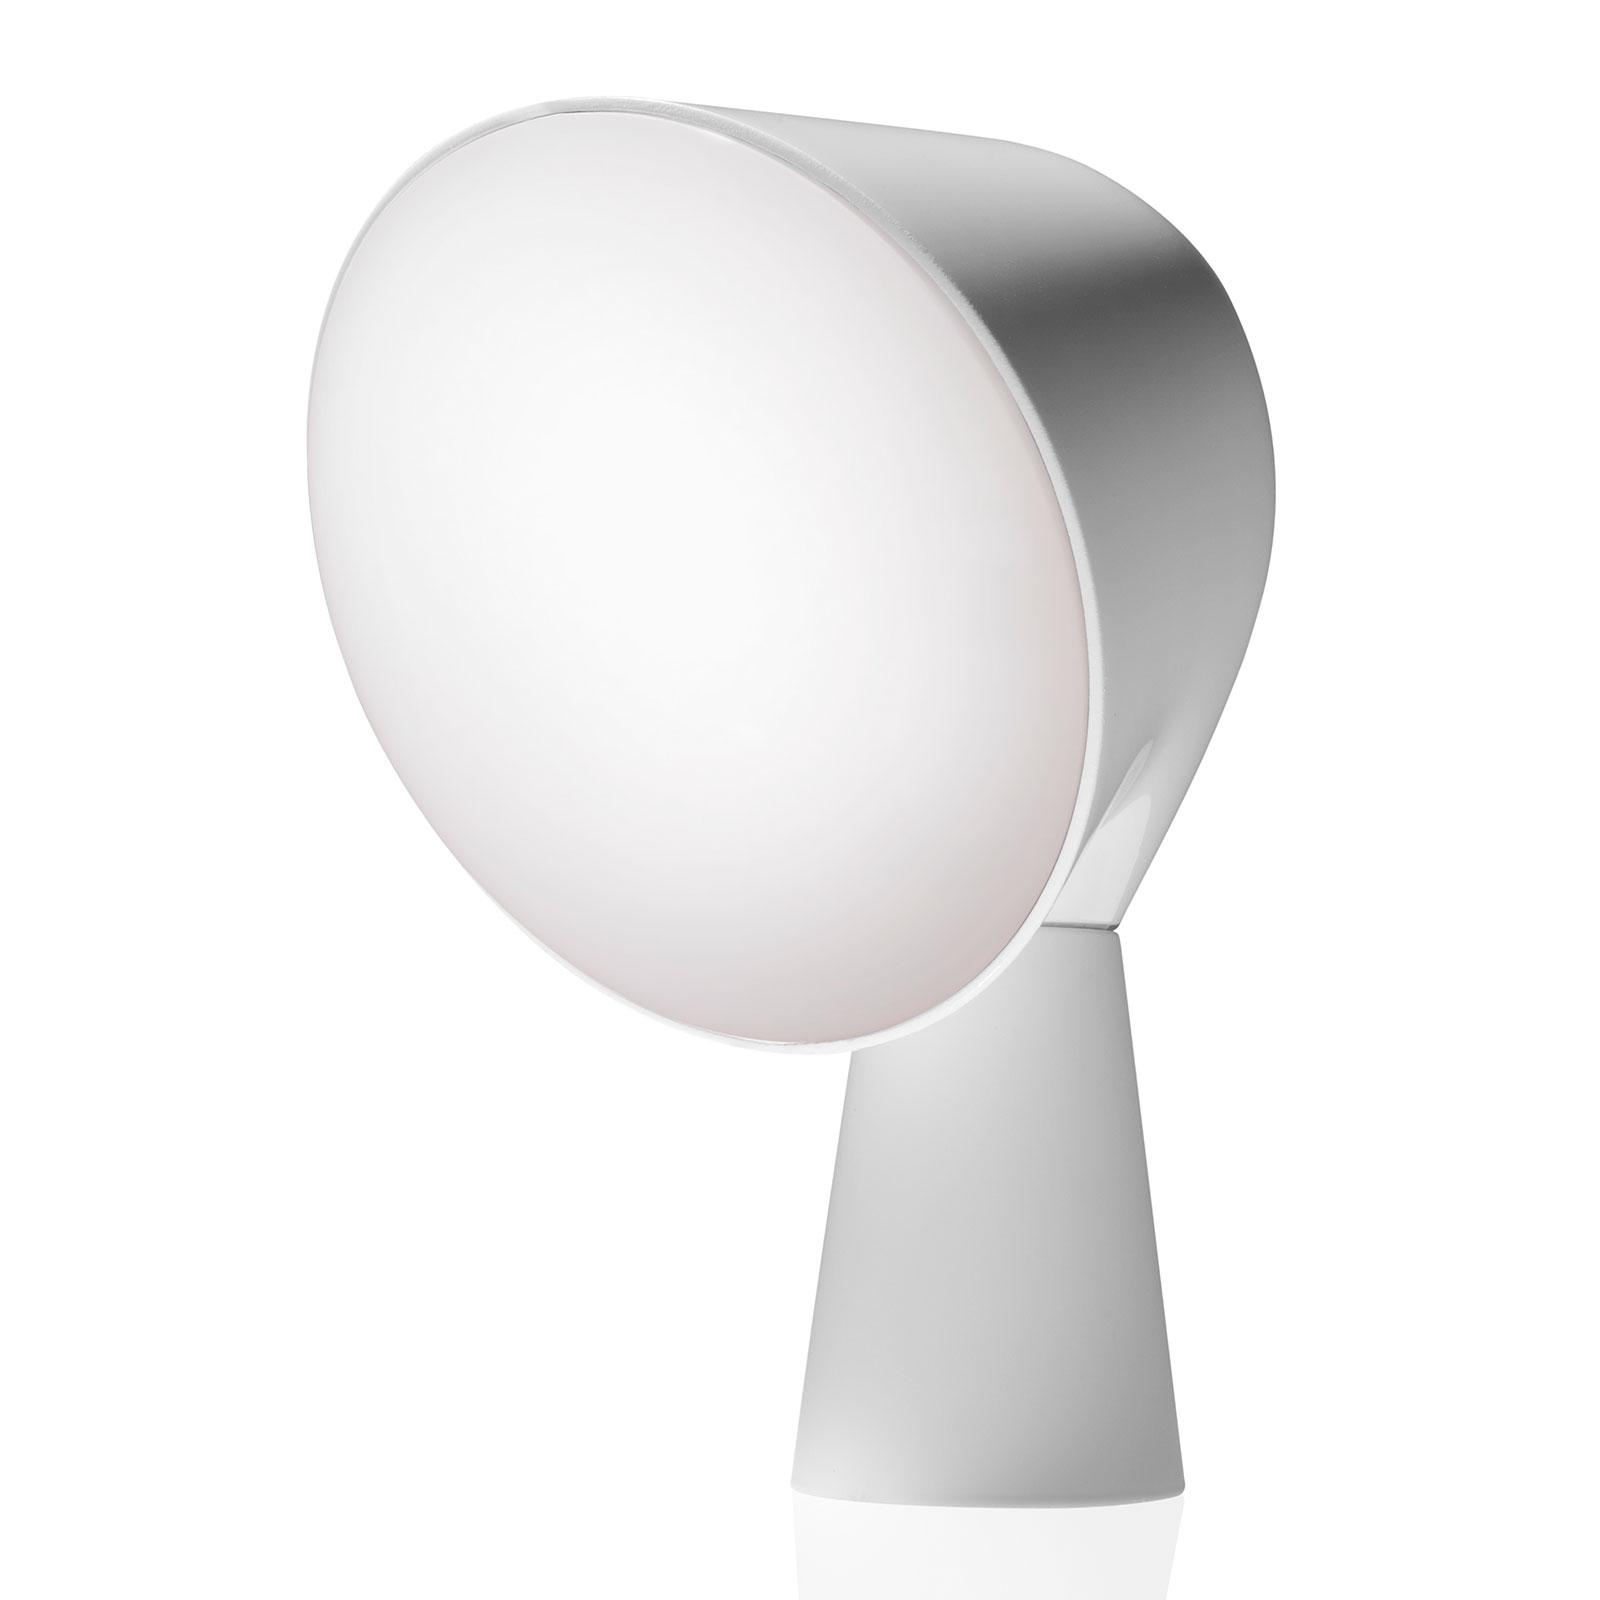 Acquista Foscarini Binic lampada da tavolo